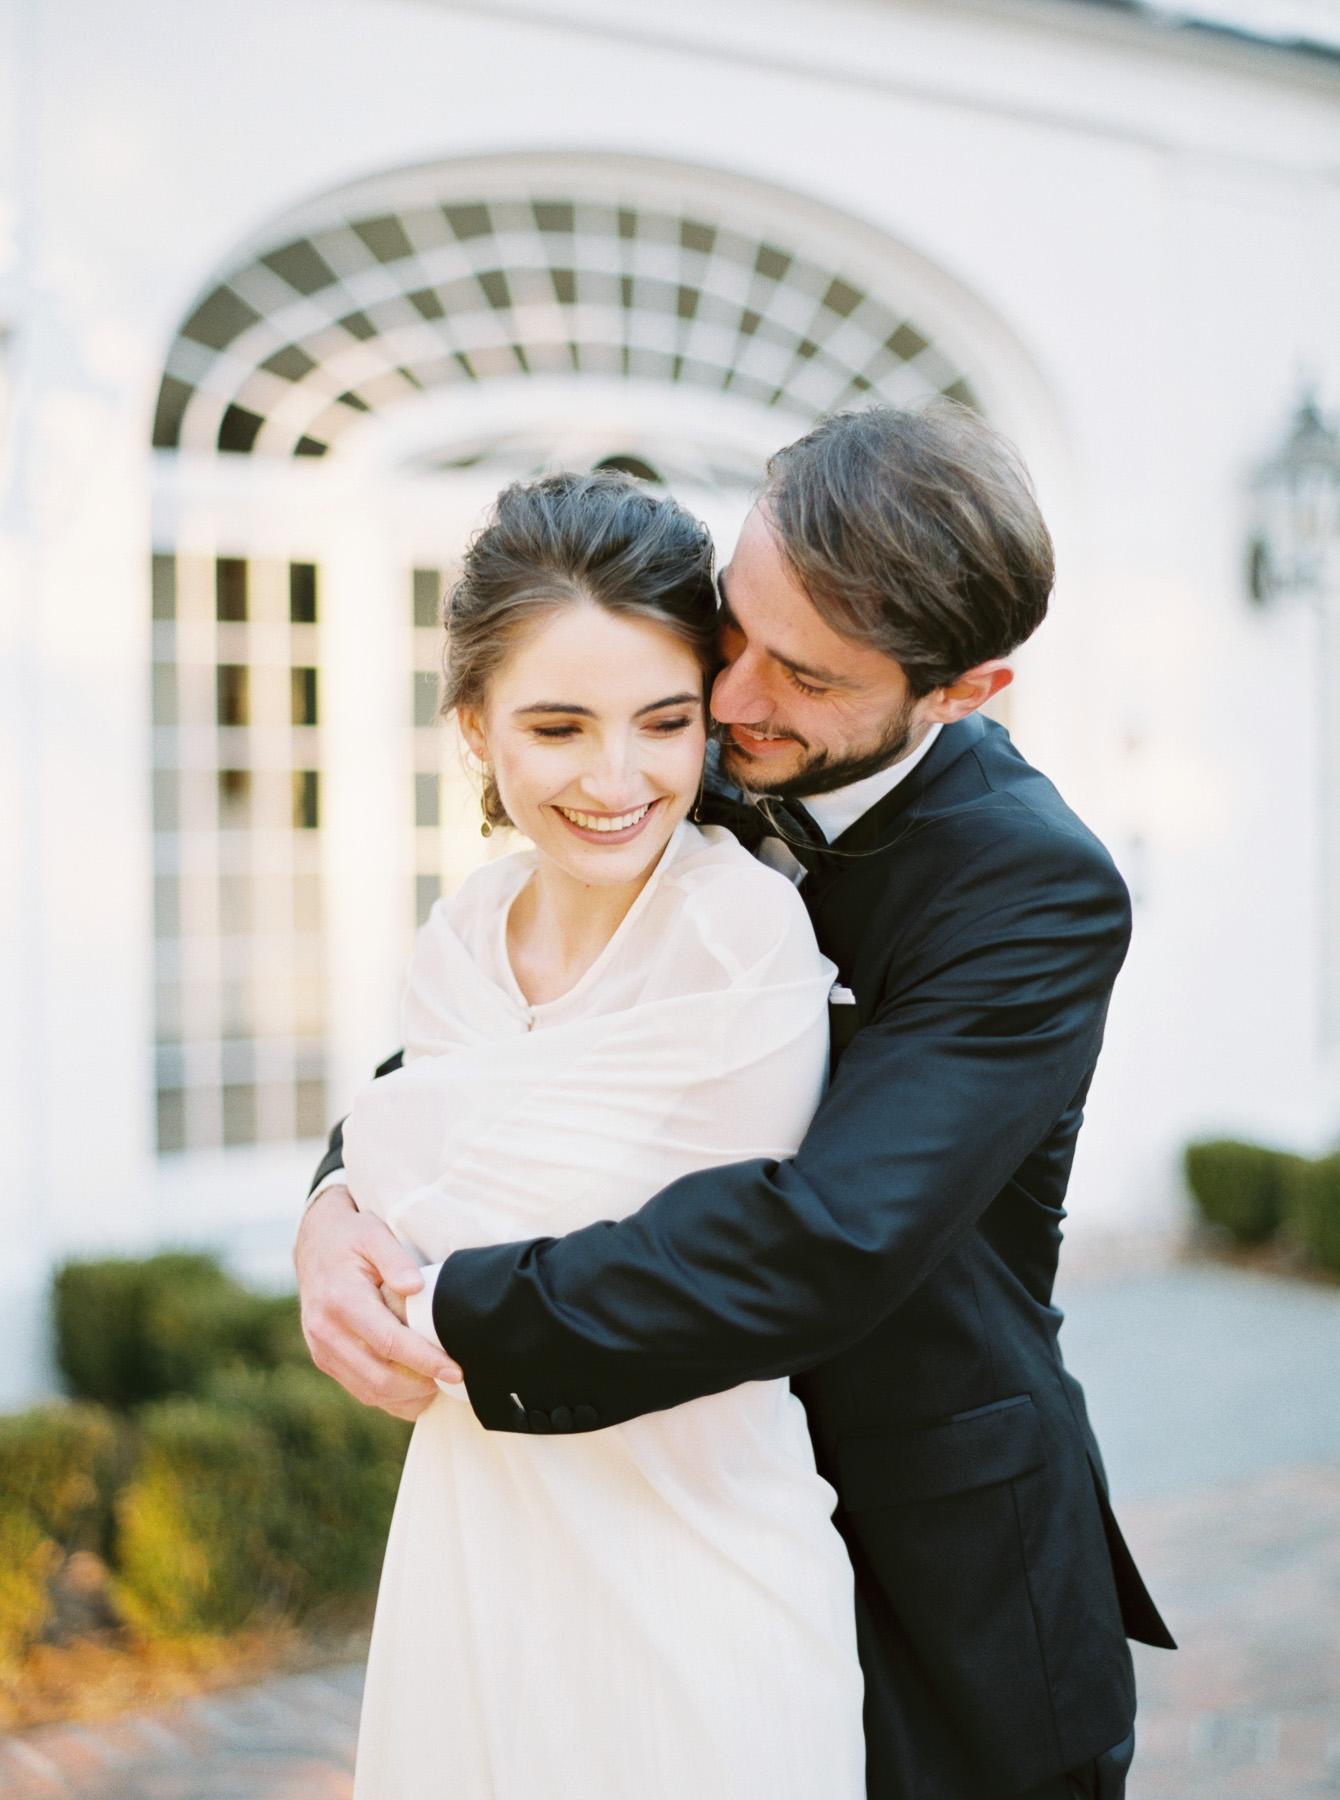 Carlos-Hernandez-Fine-Art-Film-Wedding-Photography-Charleston-SC-South-Carolina-Lowndes-Grove-Plantation-012